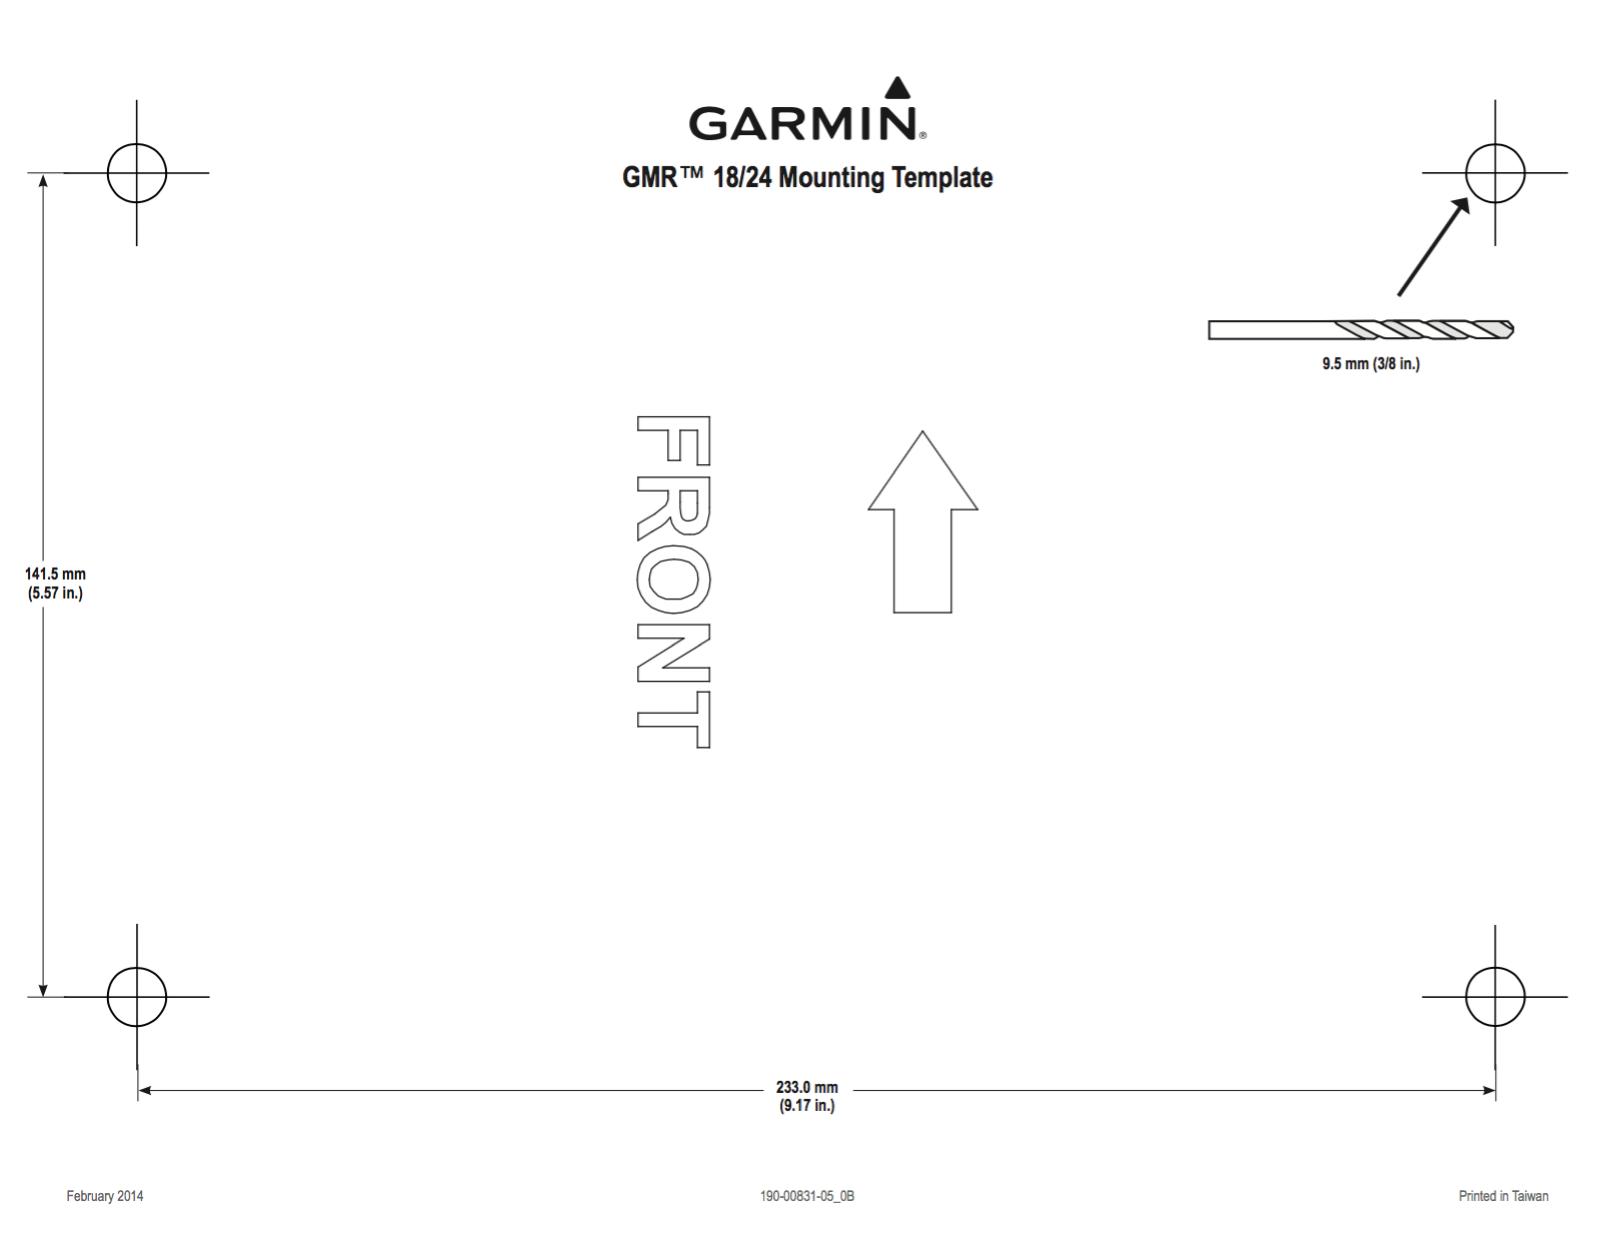 gmr 18 hd radar mounting template